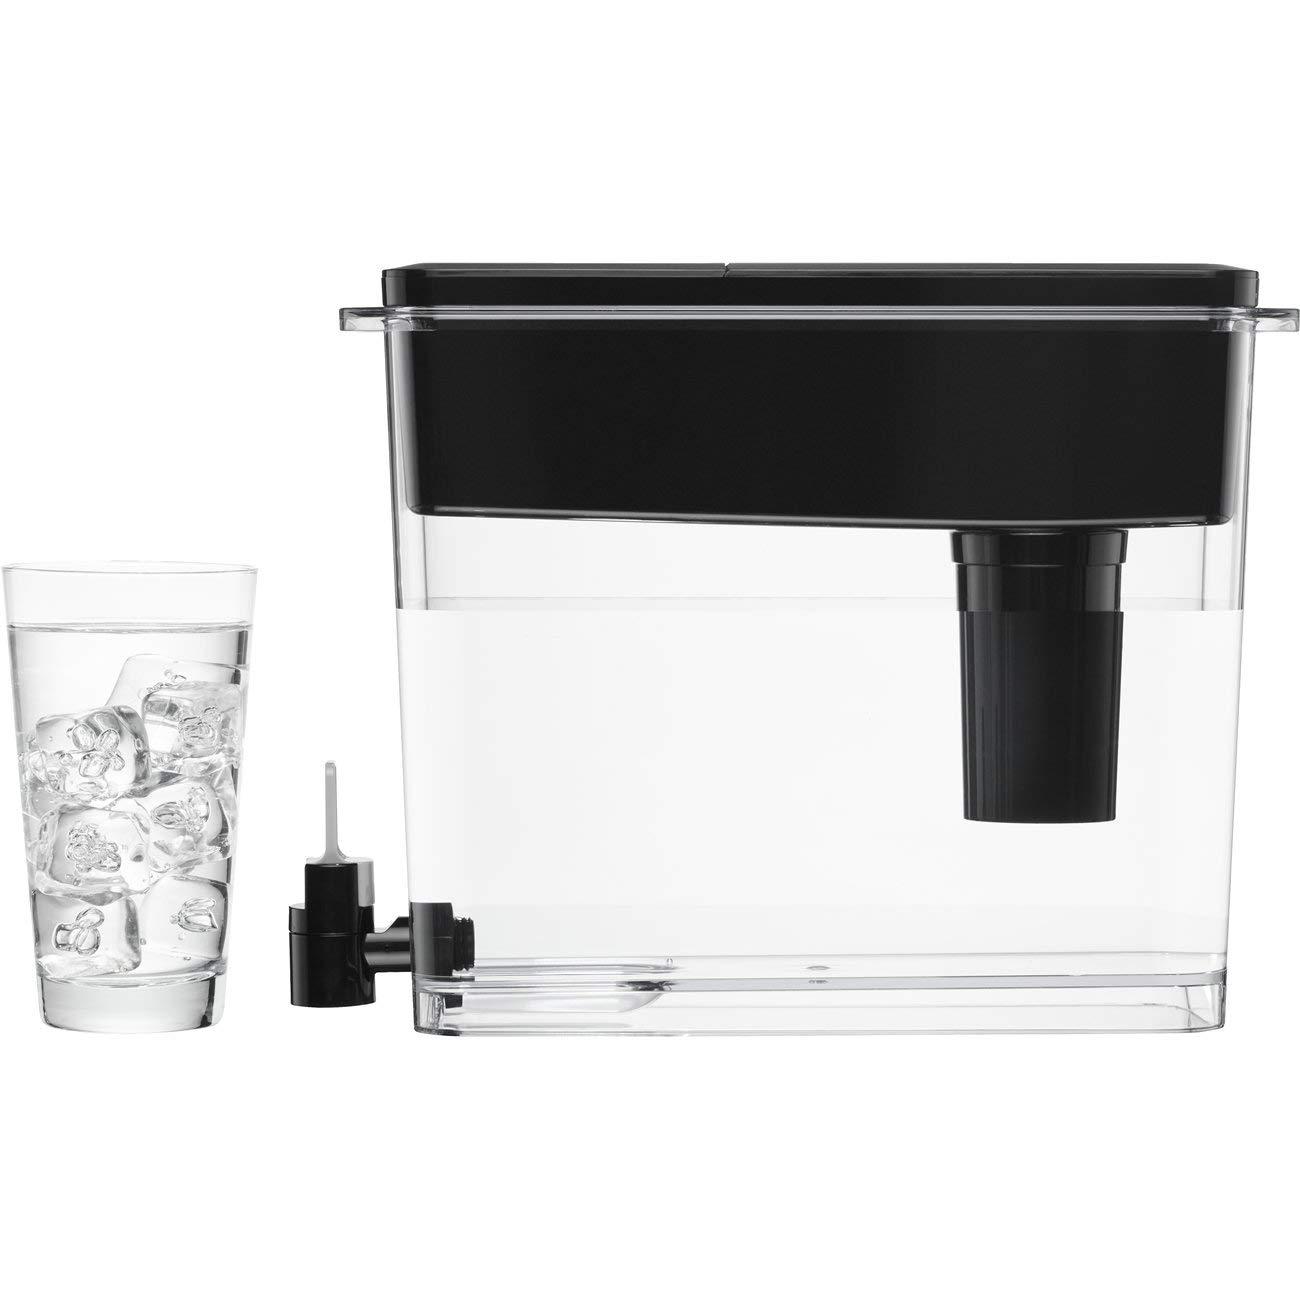 Amazon.com: Dispensador de agua UltraMax de Brita con 1 ...